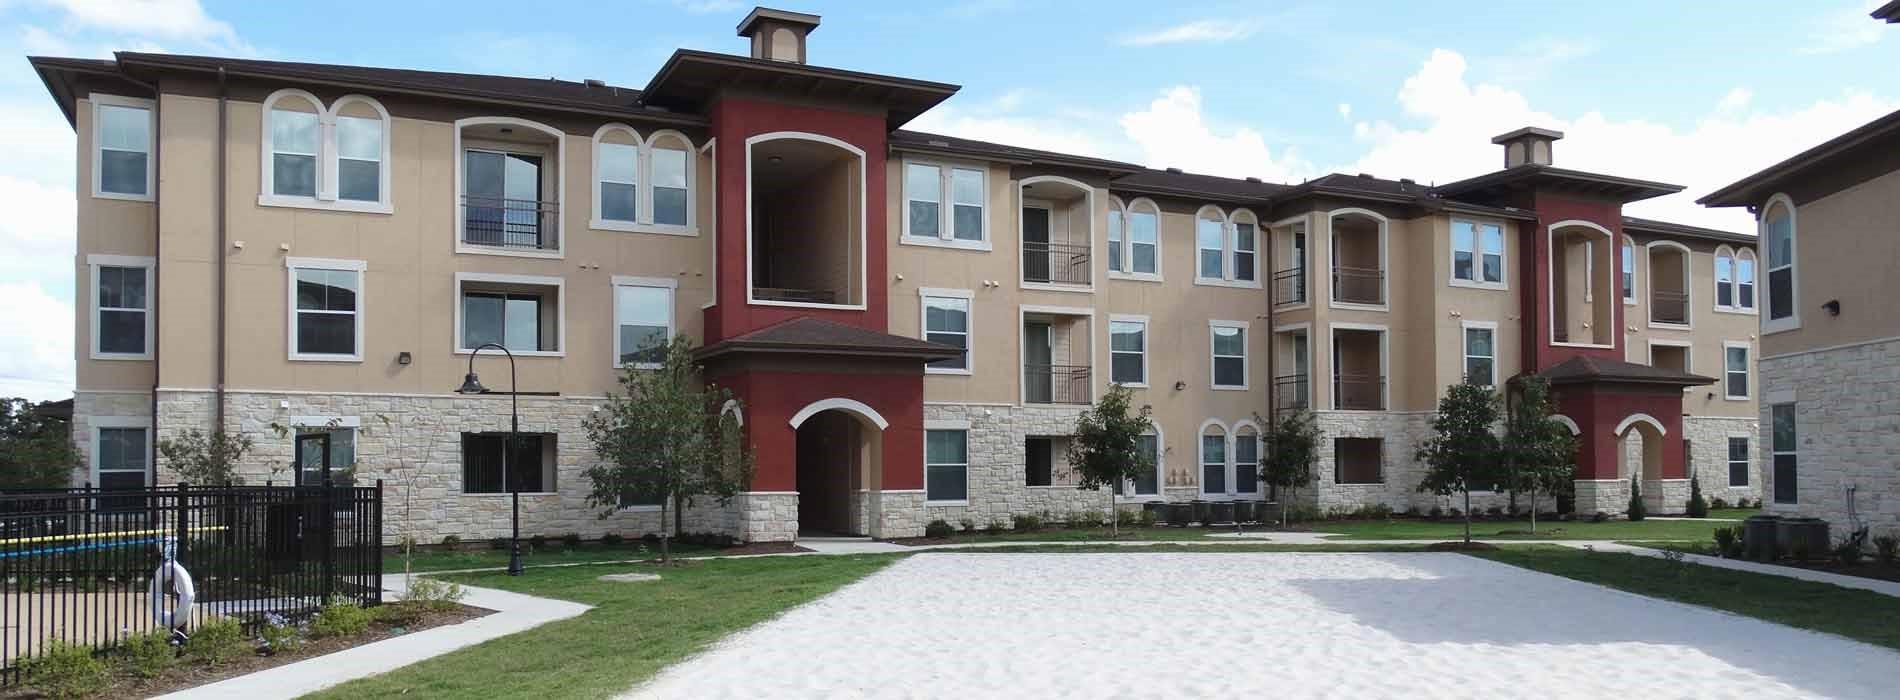 . Highland Villas   Bryan  TX    979  703 5165